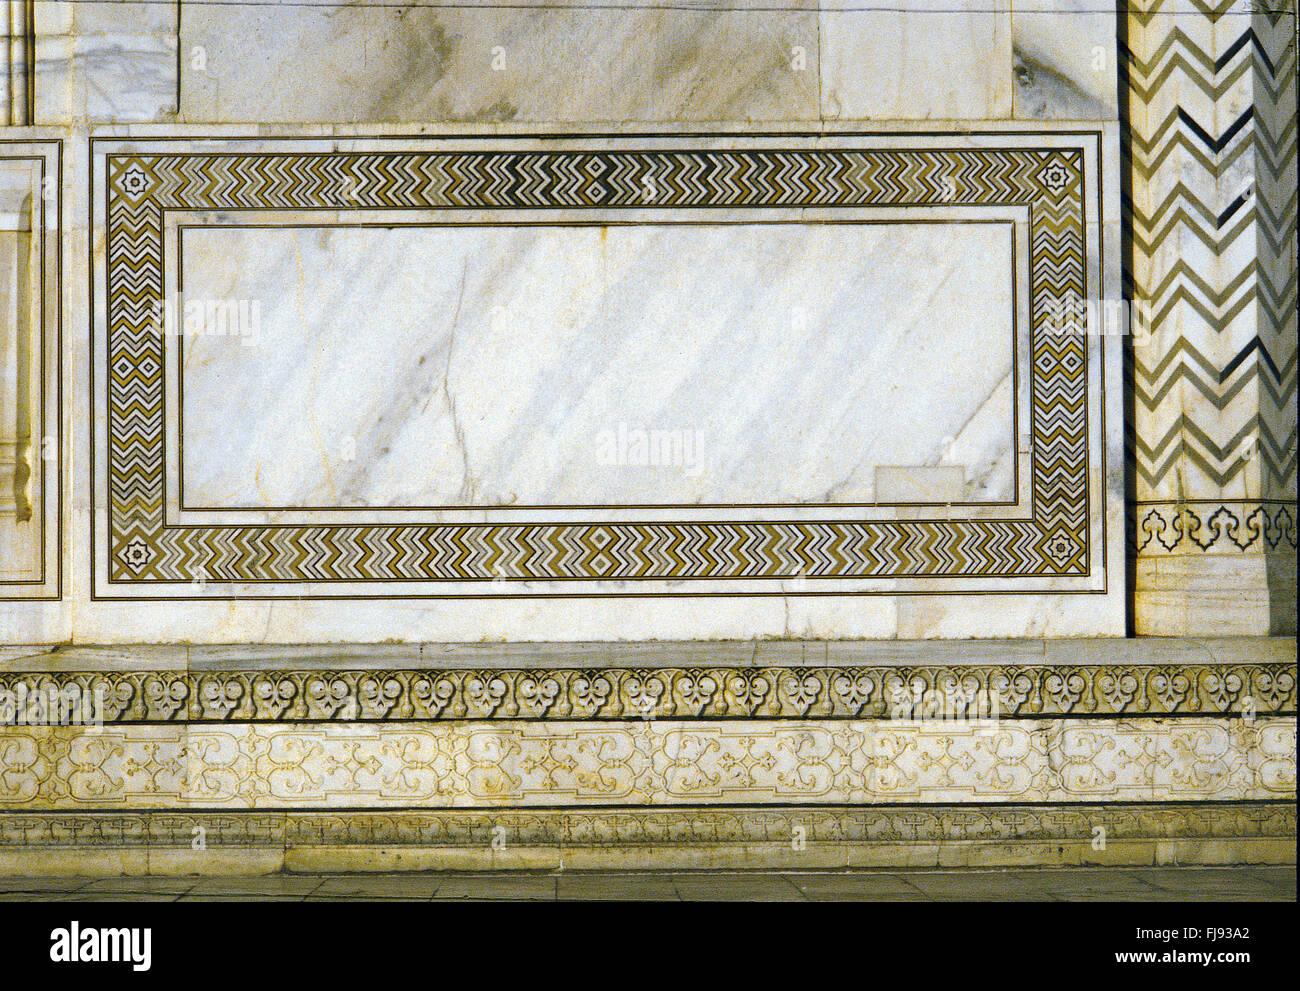 Decorative pattern design, taj mahal, agra, delhi, india, asia - Stock Image